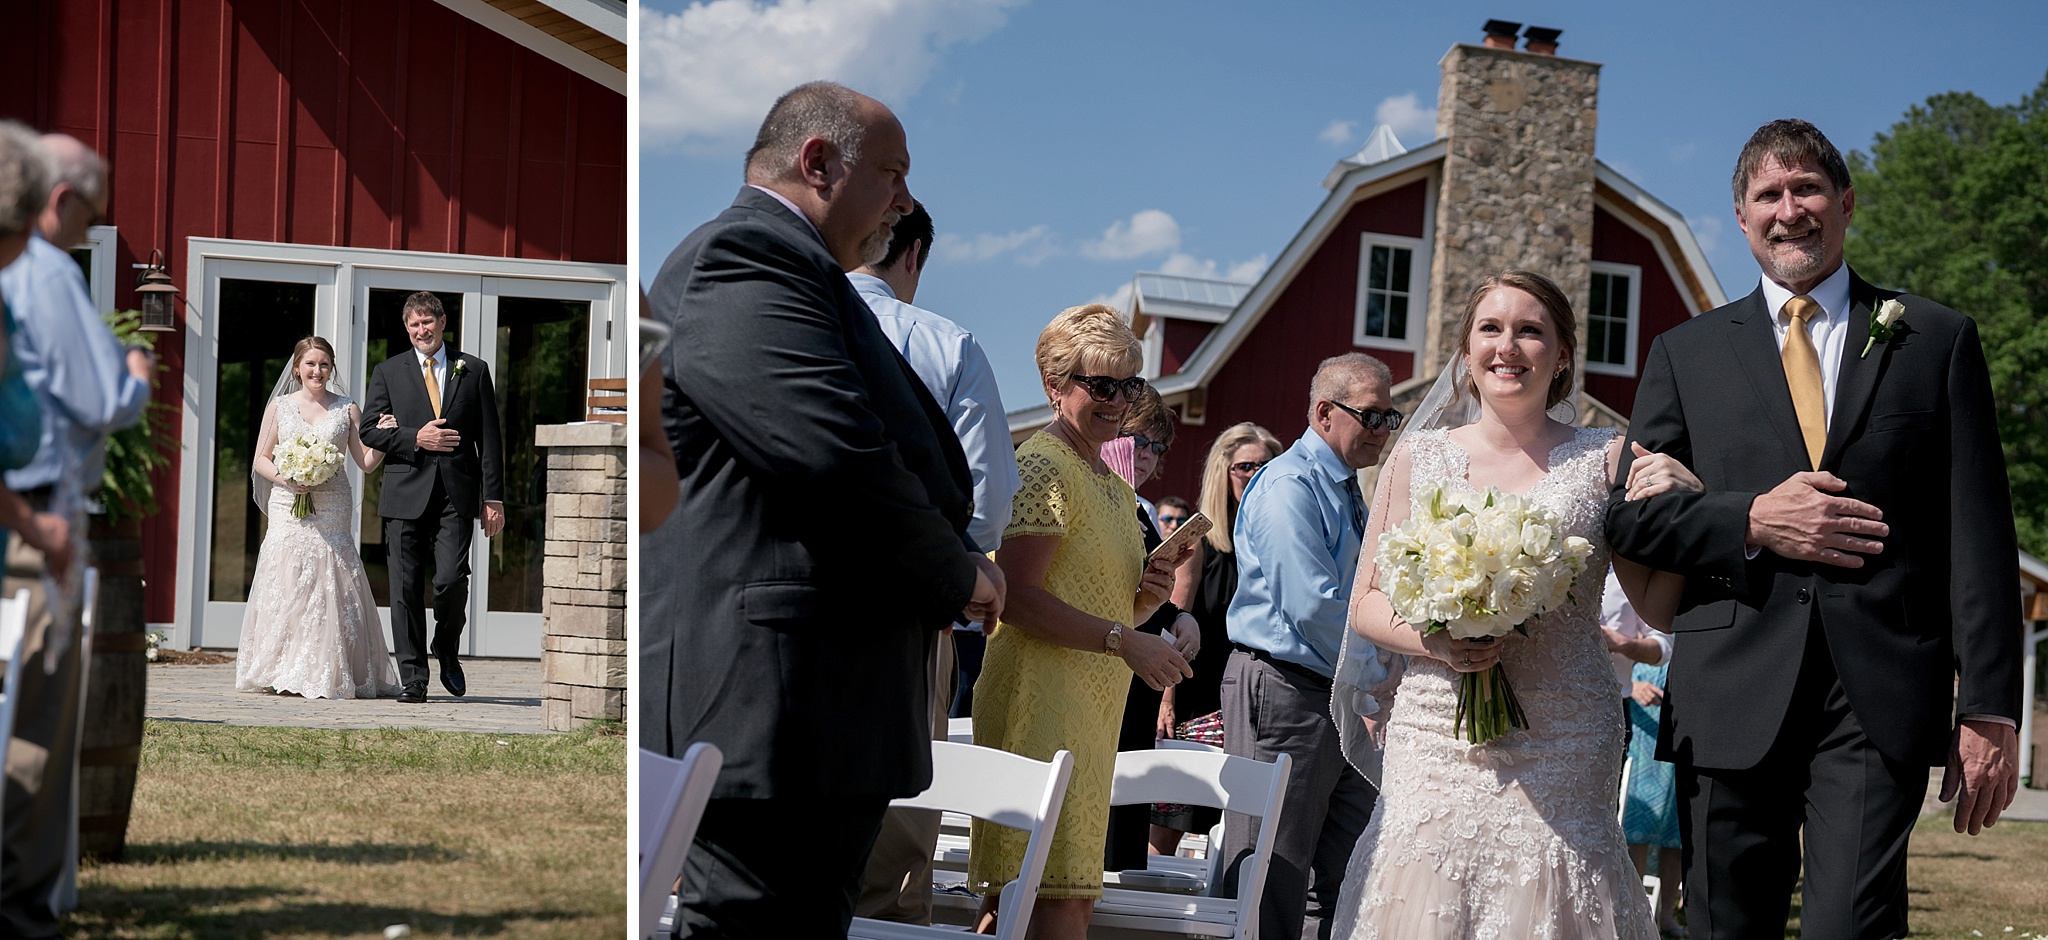 Pavilion-Carriage-Farms-Wedding-Photographer-190.jpg